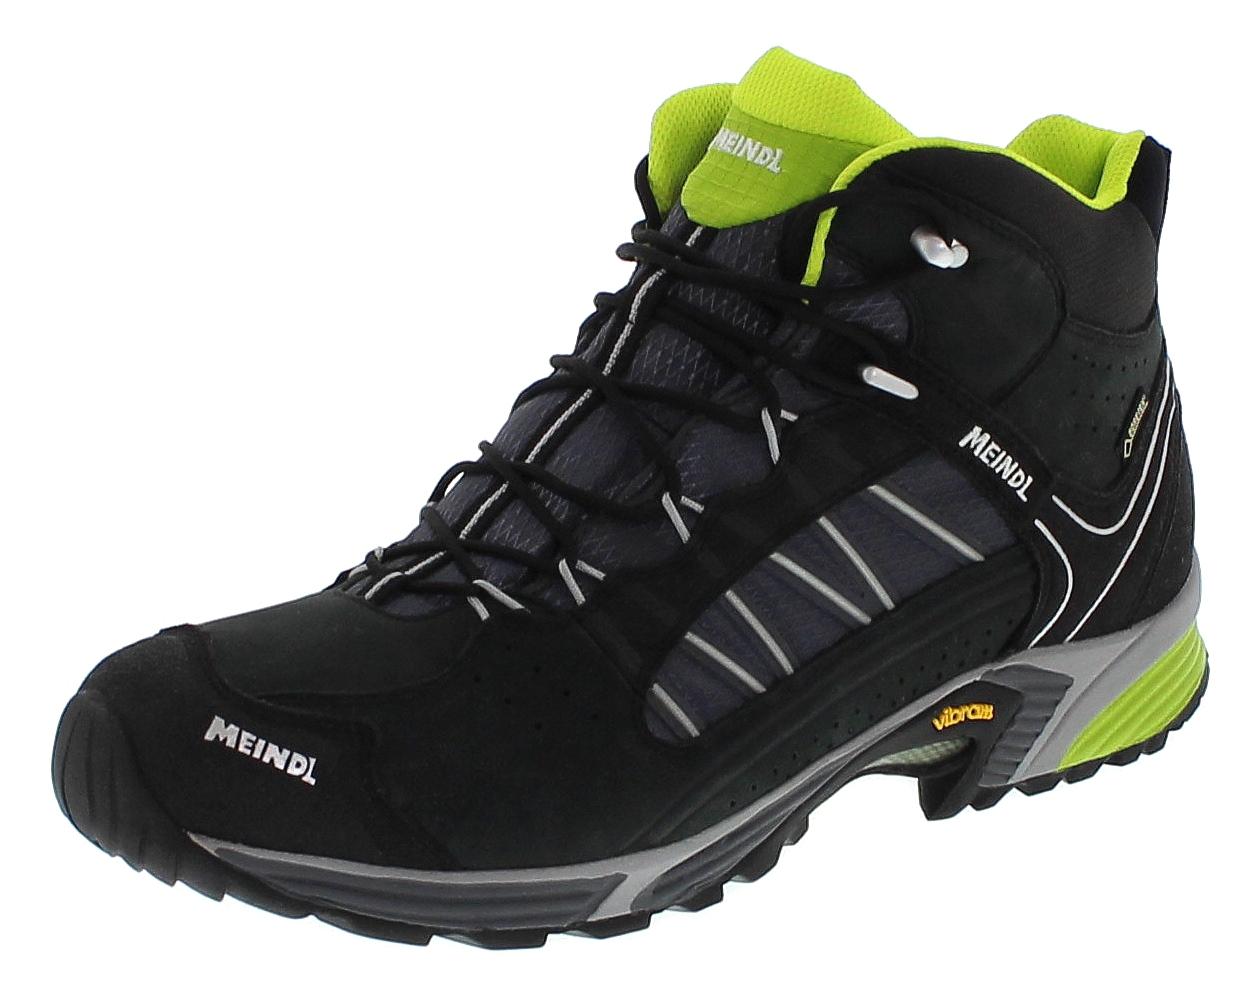 Meindl 3062-01 SX 1.1 MID GTX Schwarz Lemon Herren Hiking Schuhe